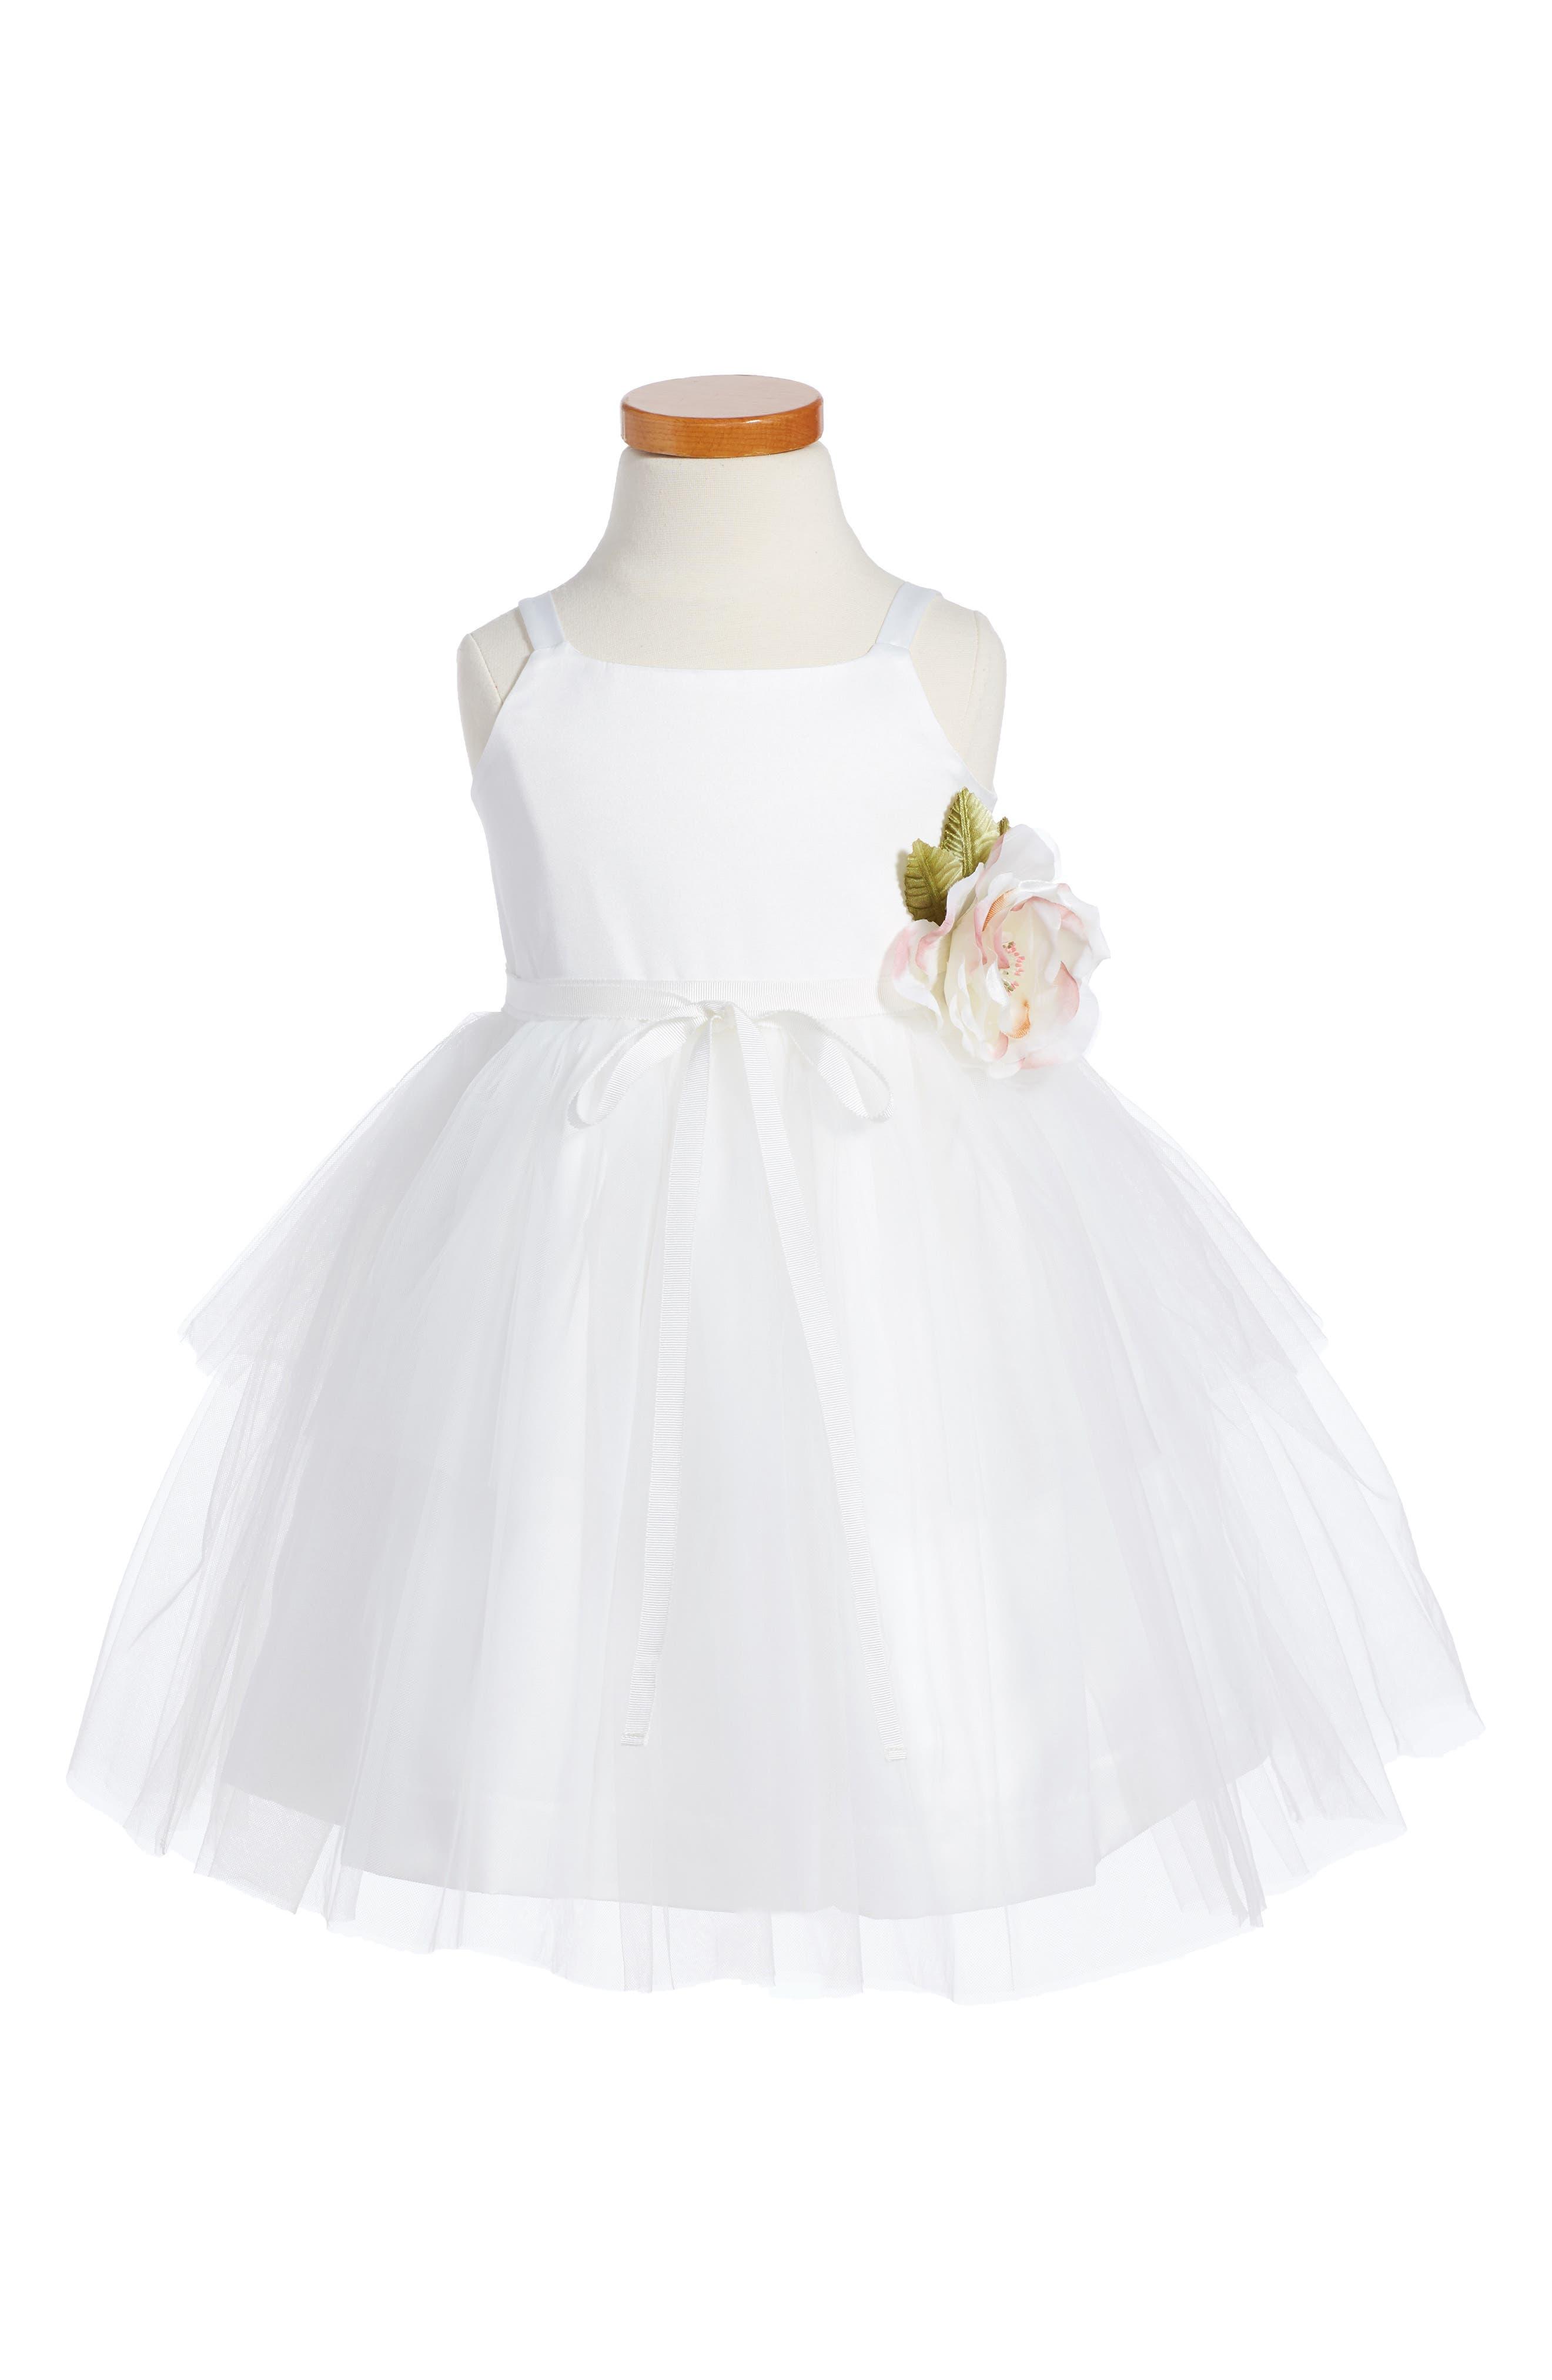 US ANGELS, 'Ballerina' Dress, Main thumbnail 1, color, IVORY